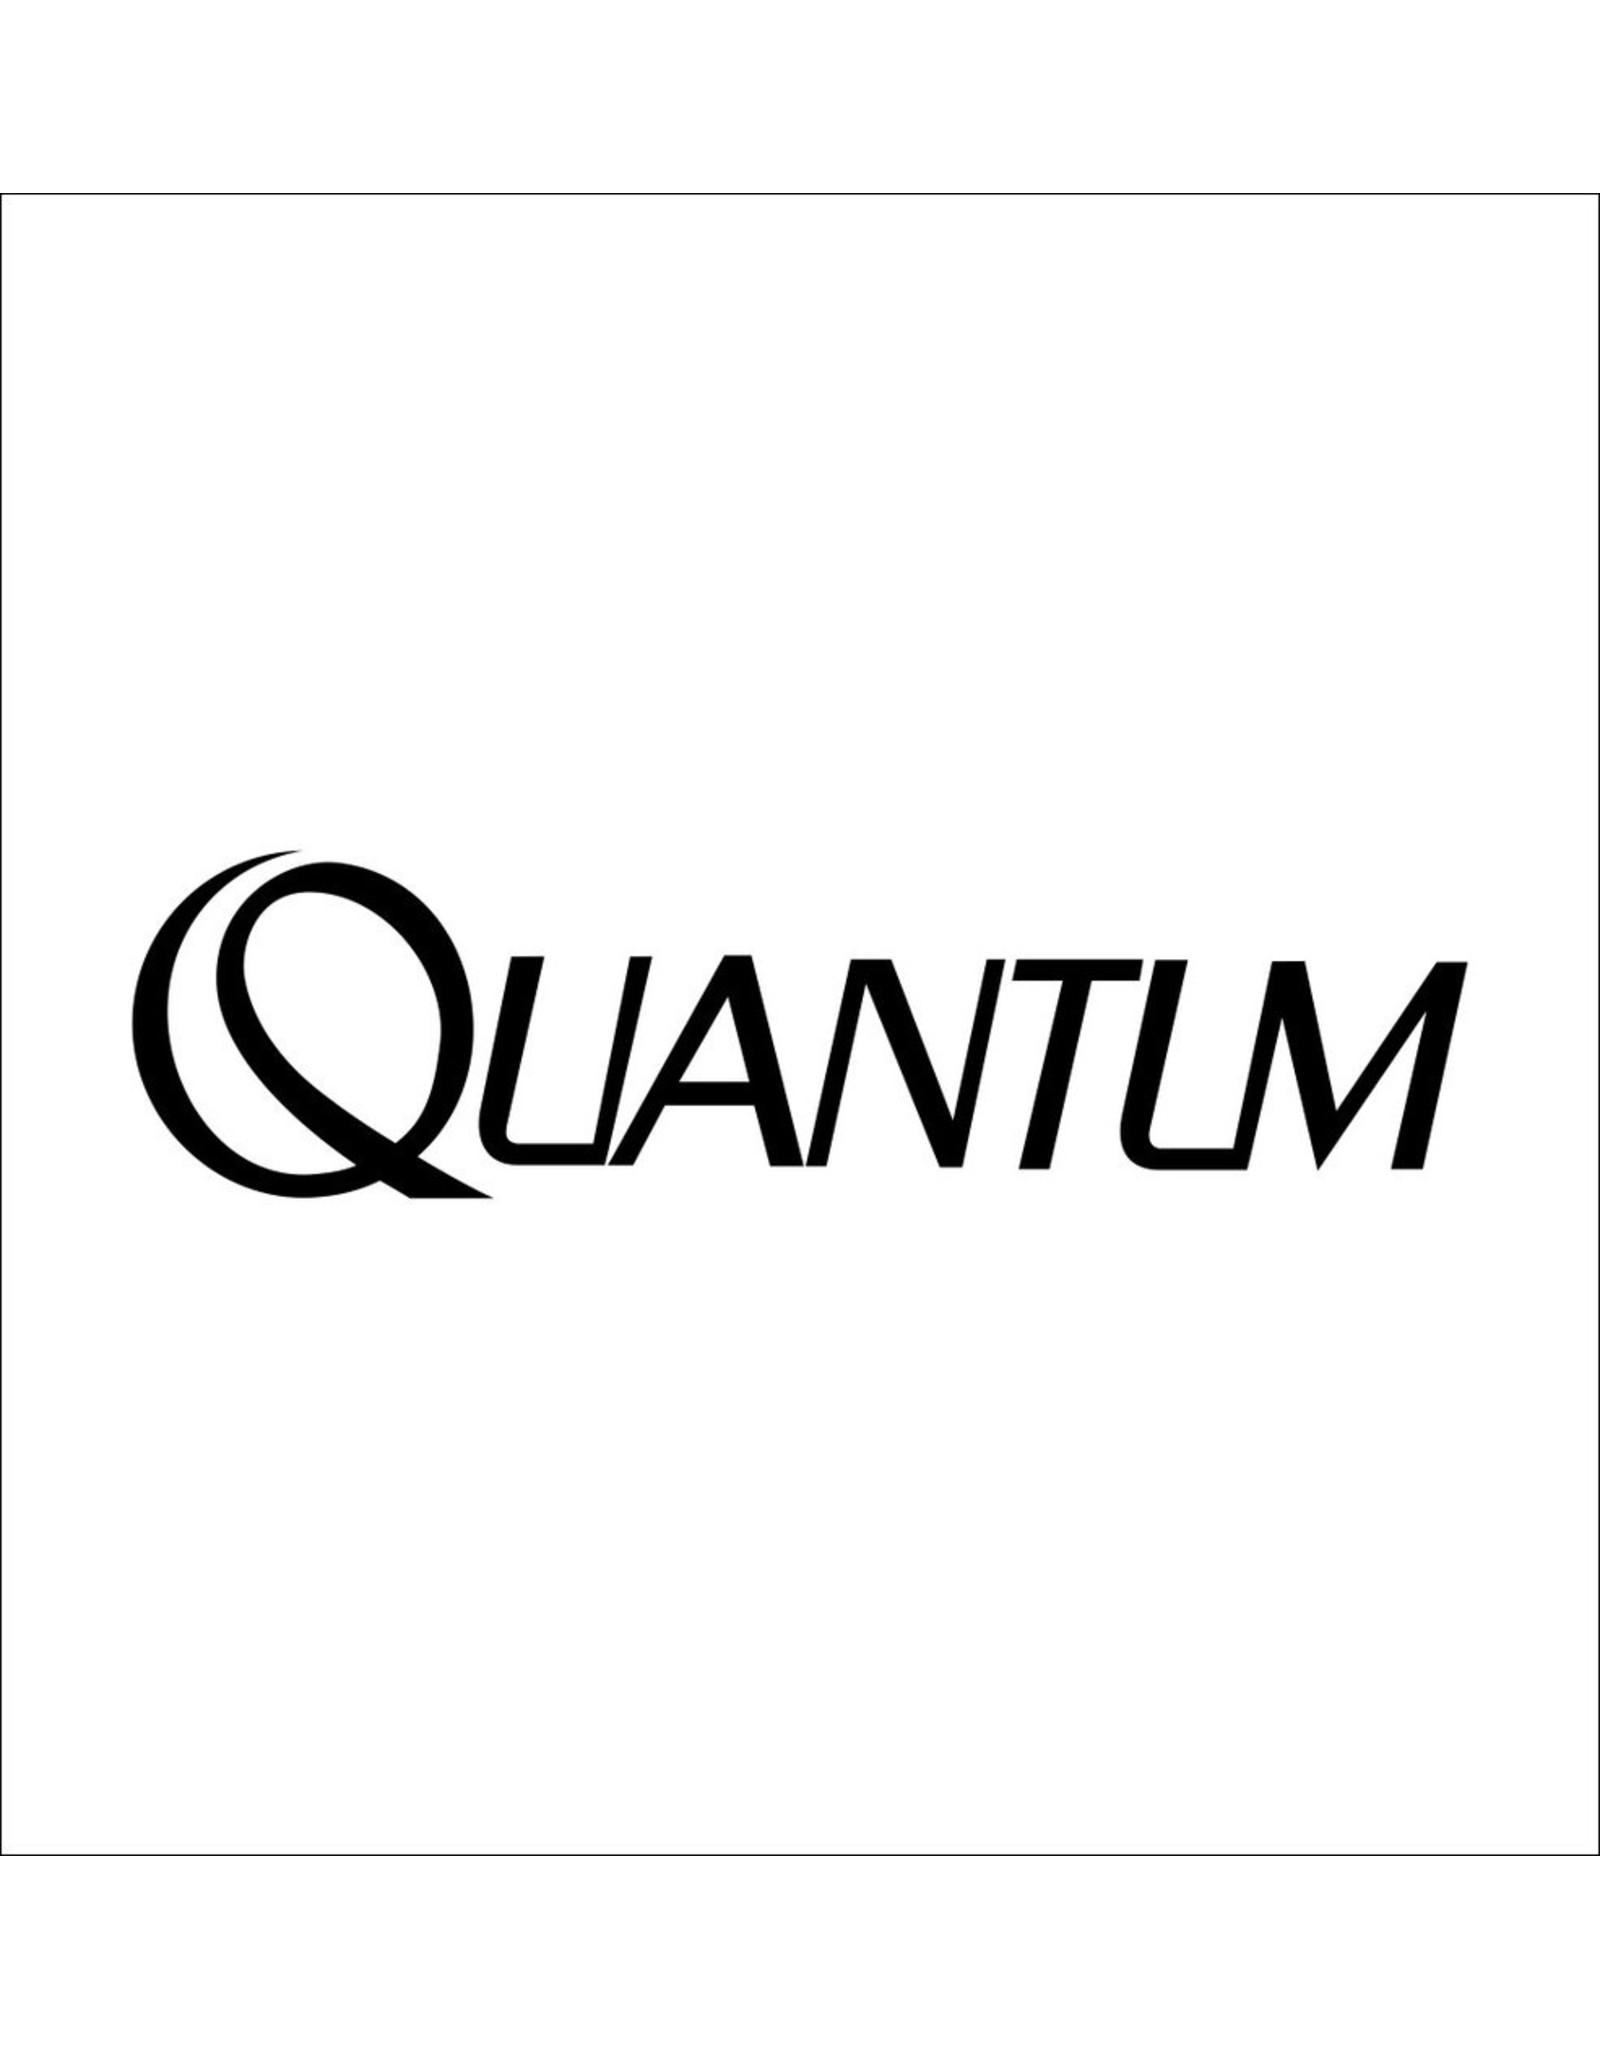 Quantum LINE GUIDE CARRIER